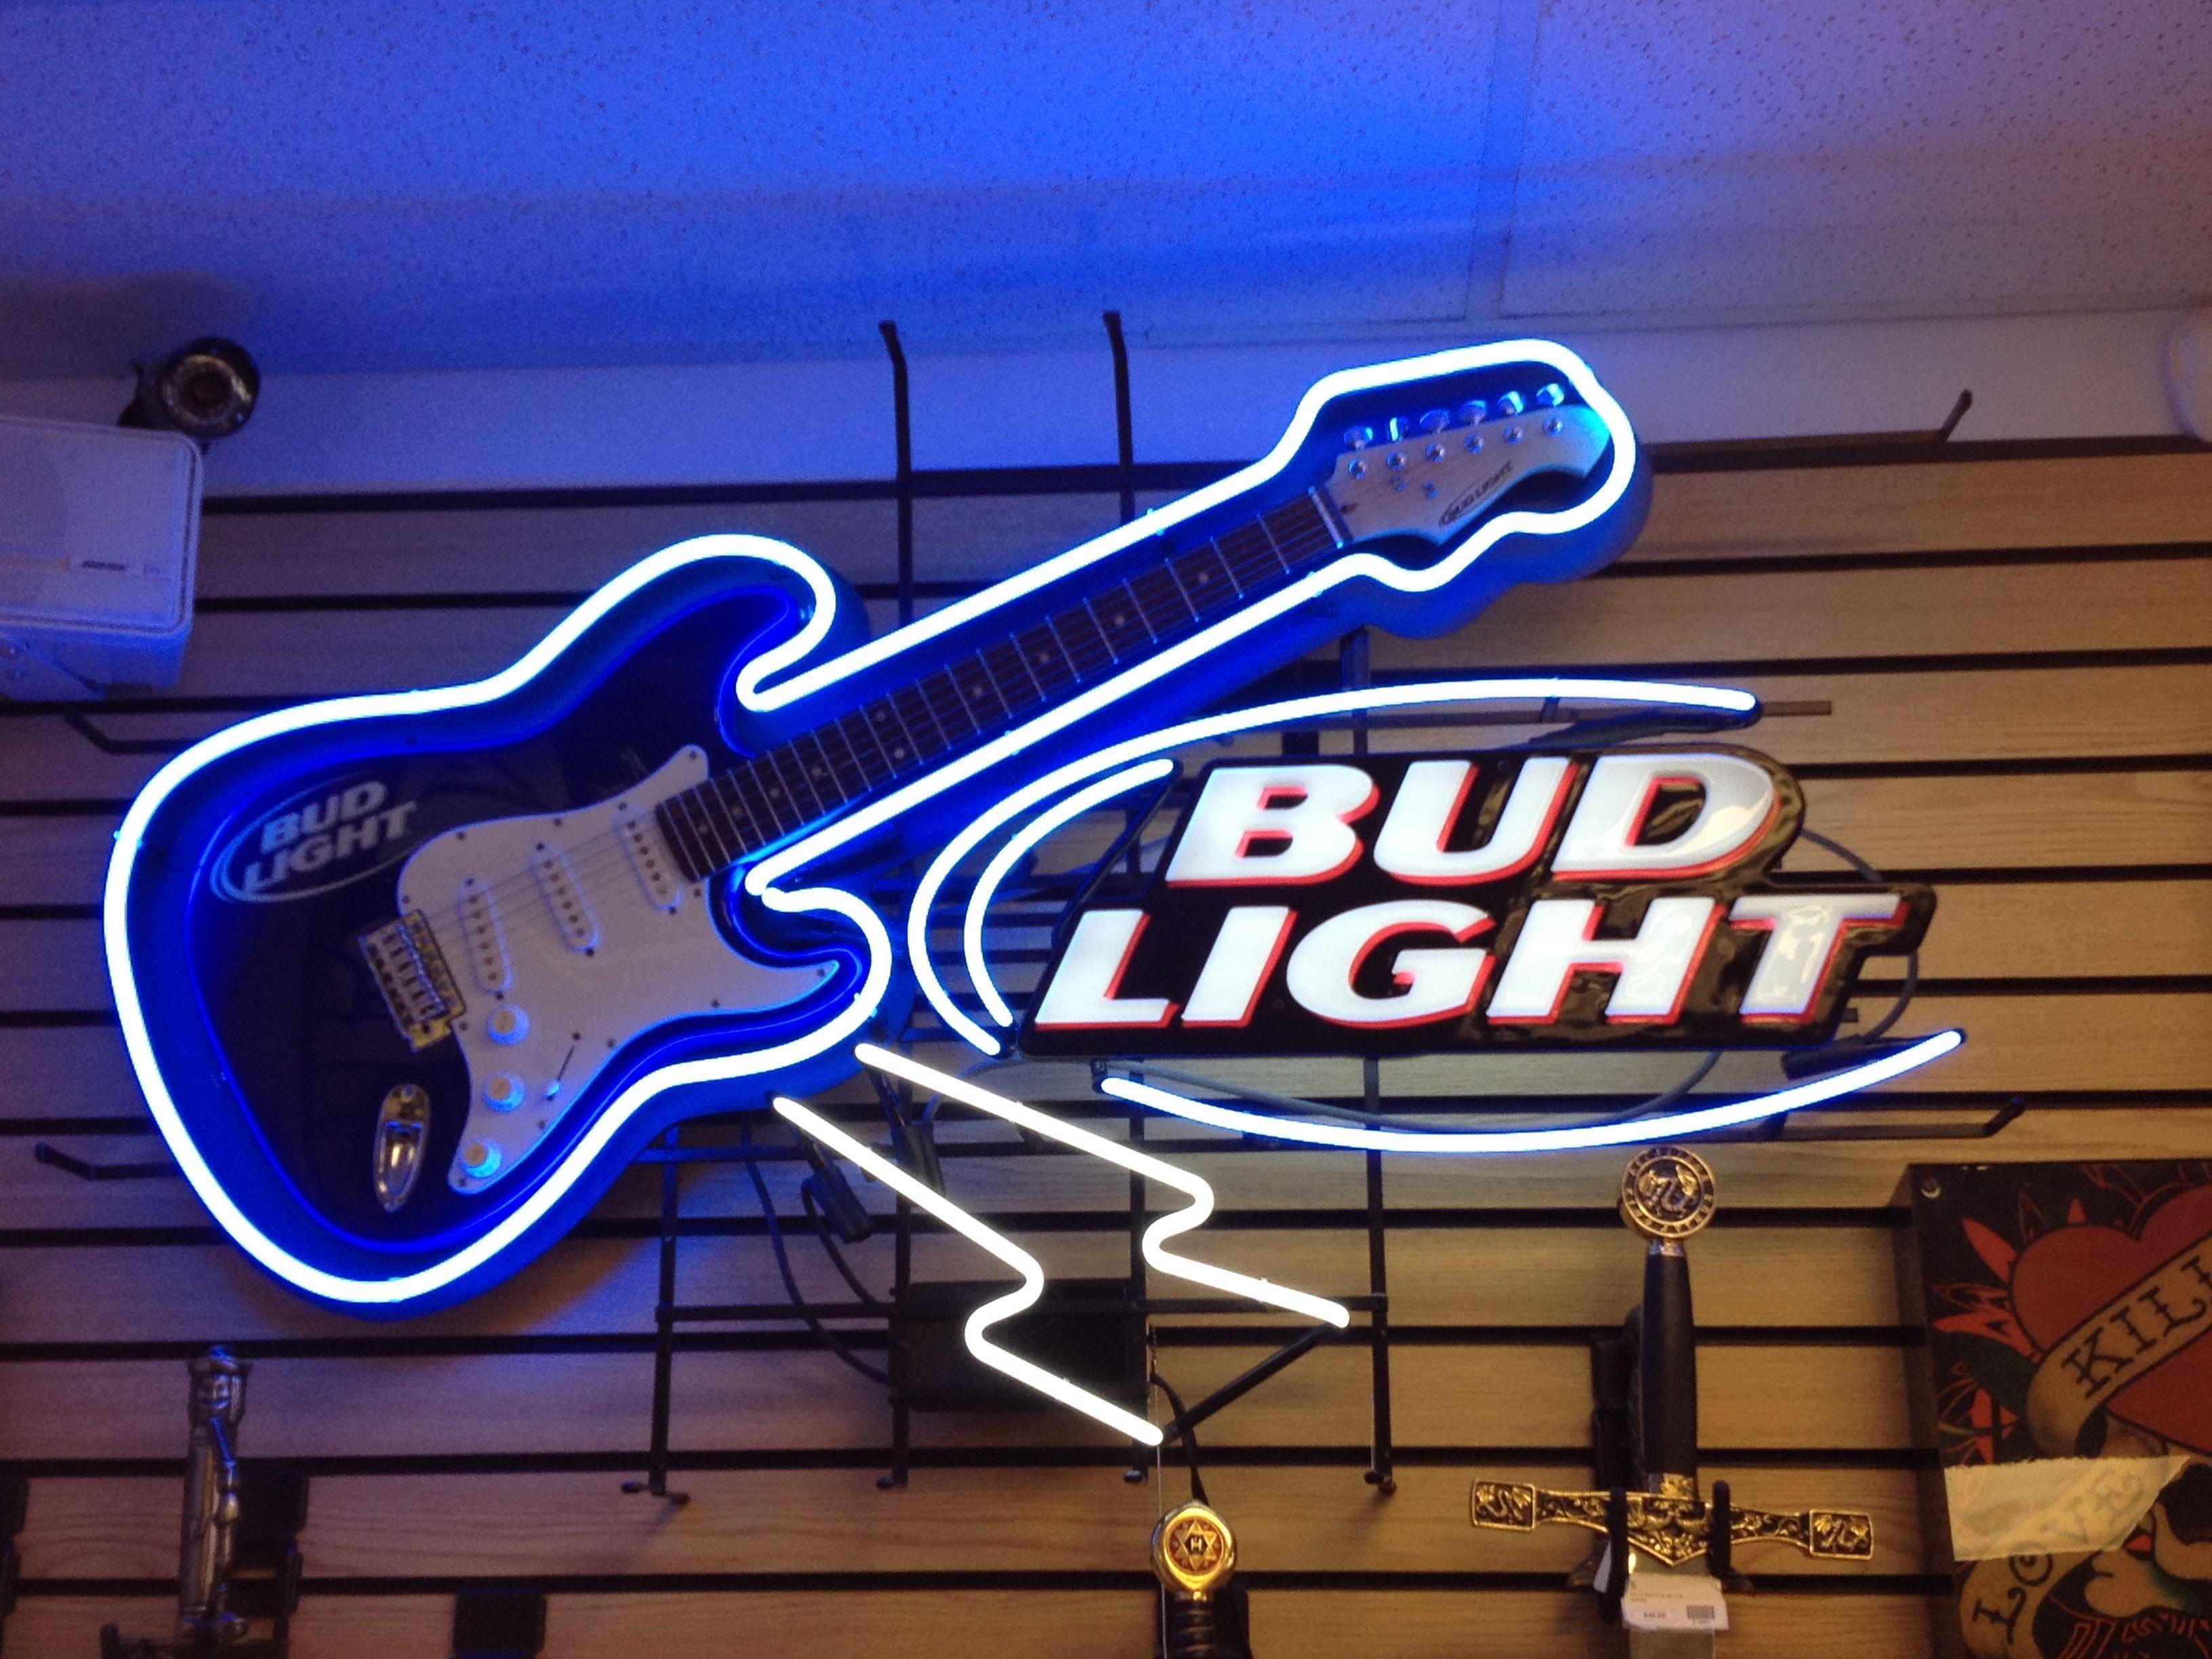 Bud Light Neon Sign w/Guitar For Sale 732 228 7089 | Bud